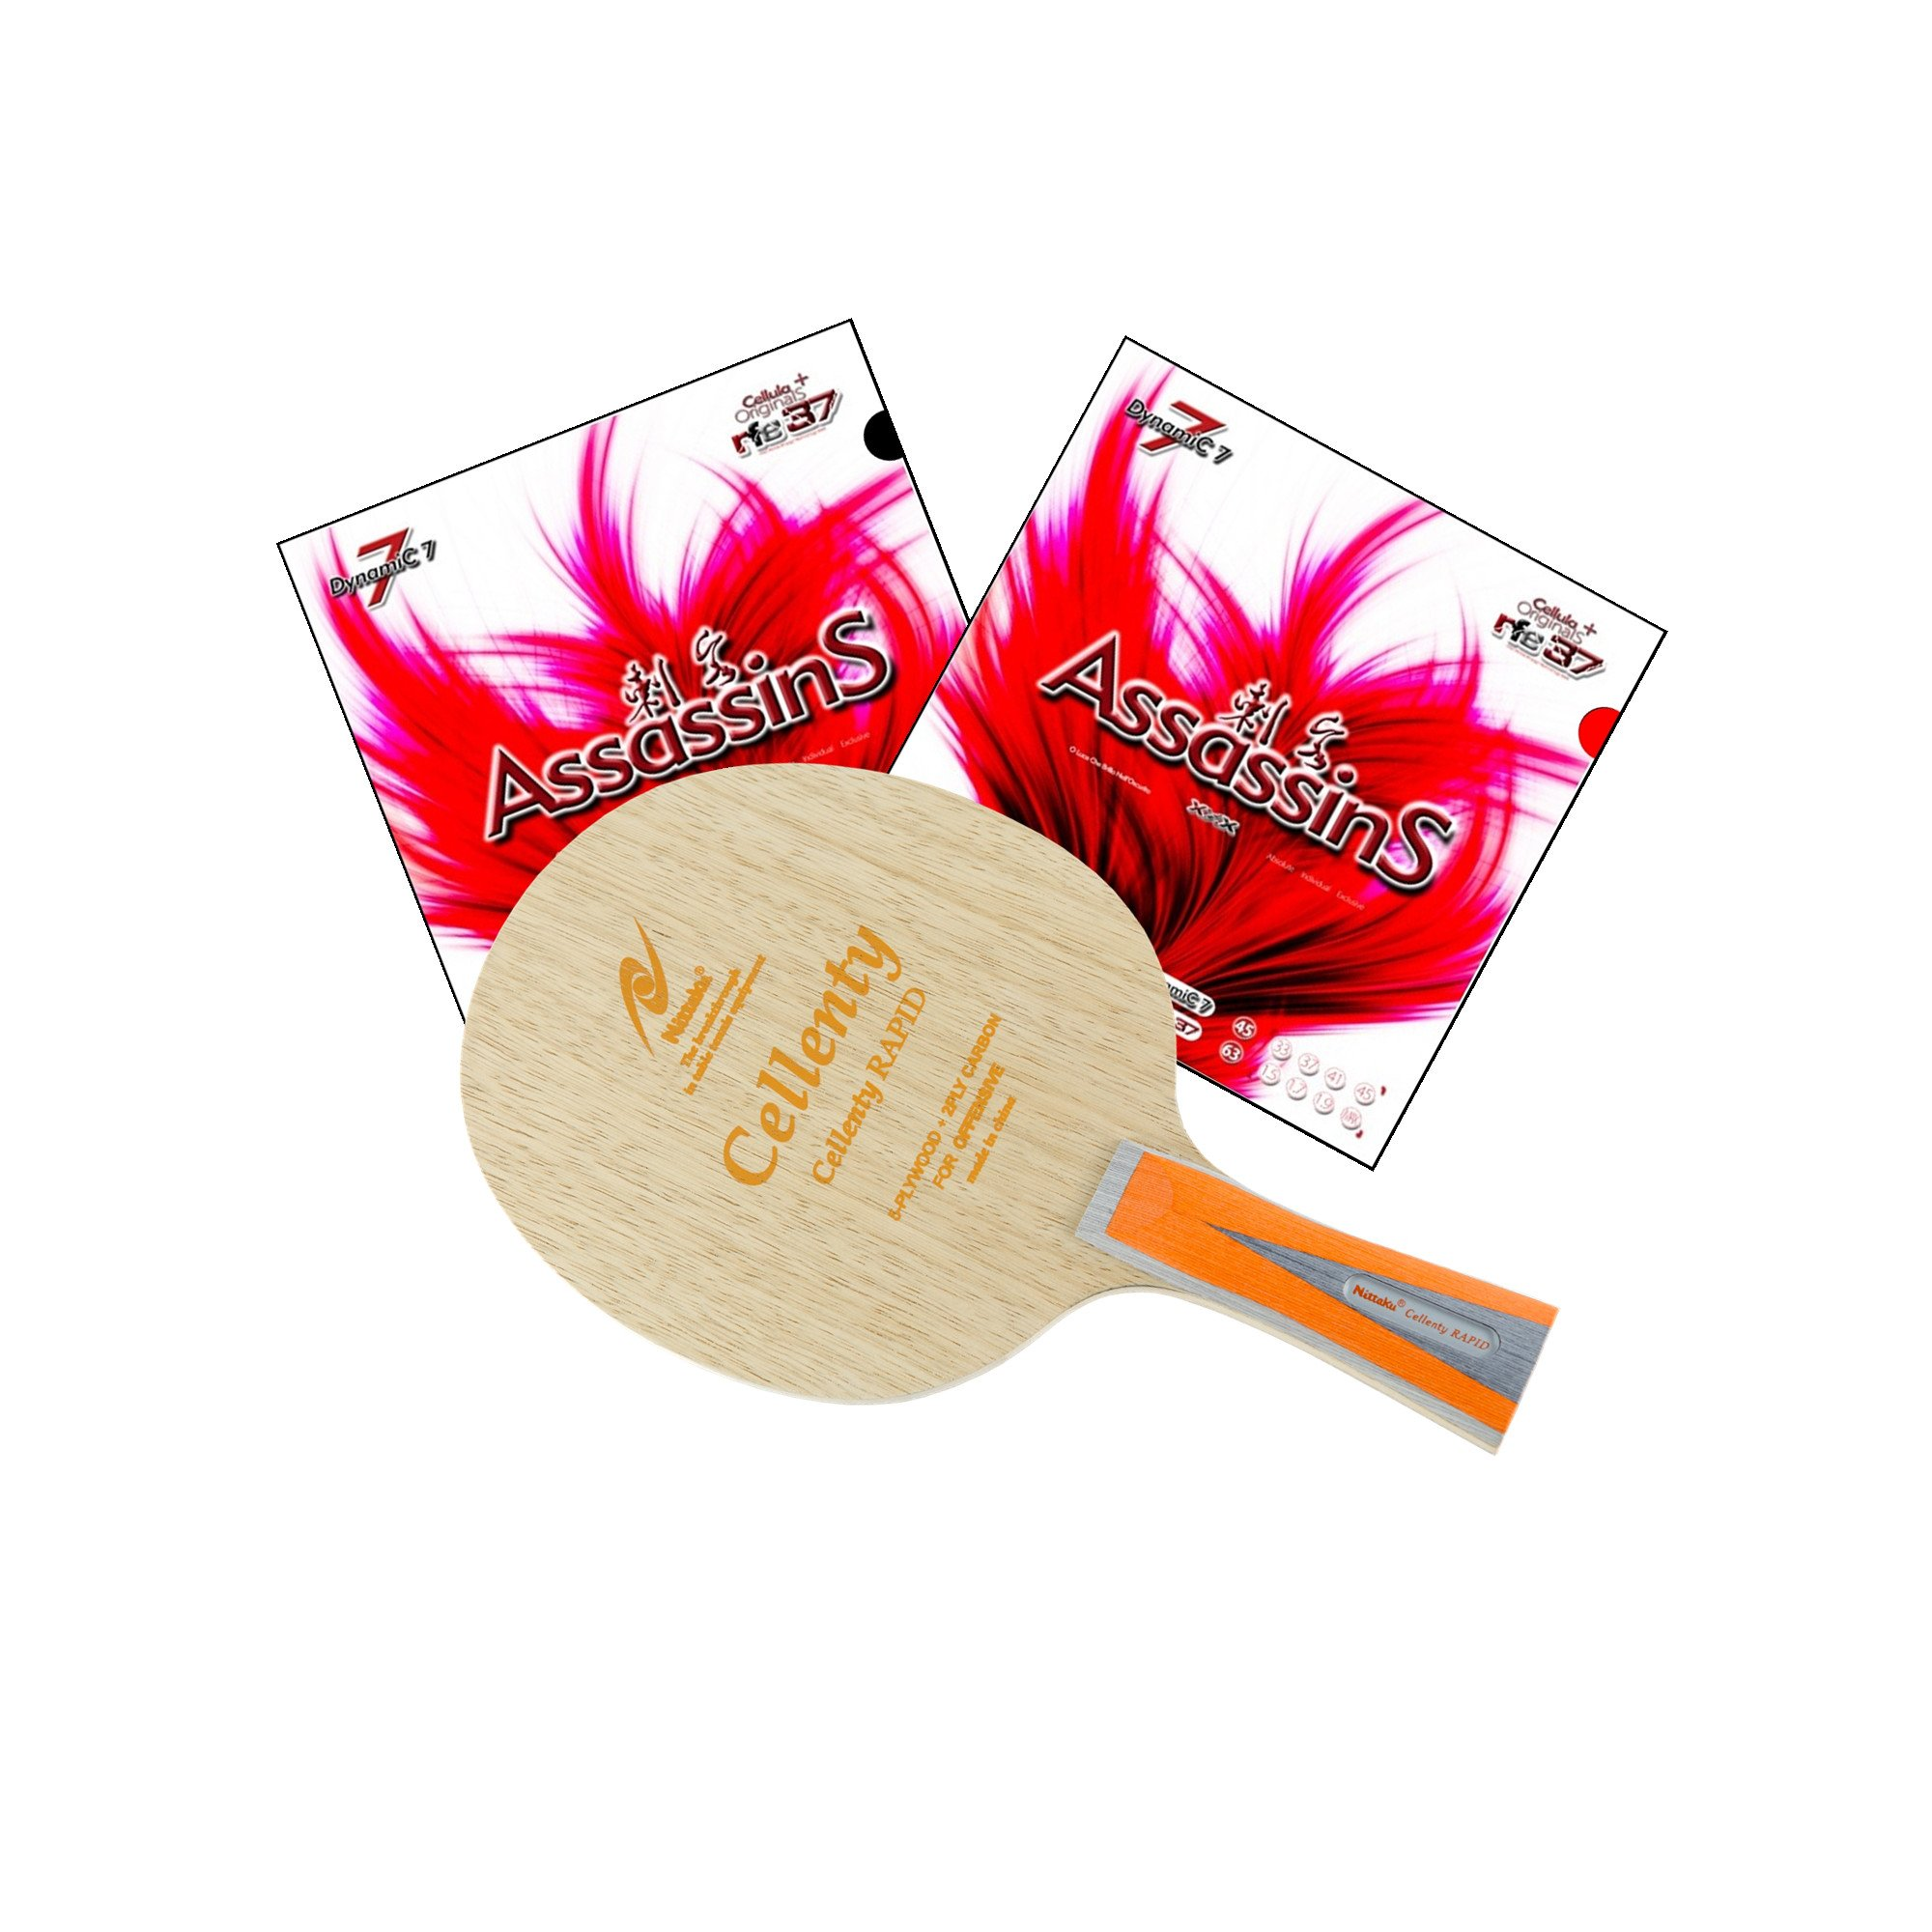 Nittaku Cellenty Rapid Carbon FL + Air Assassins Table Tennis Racket